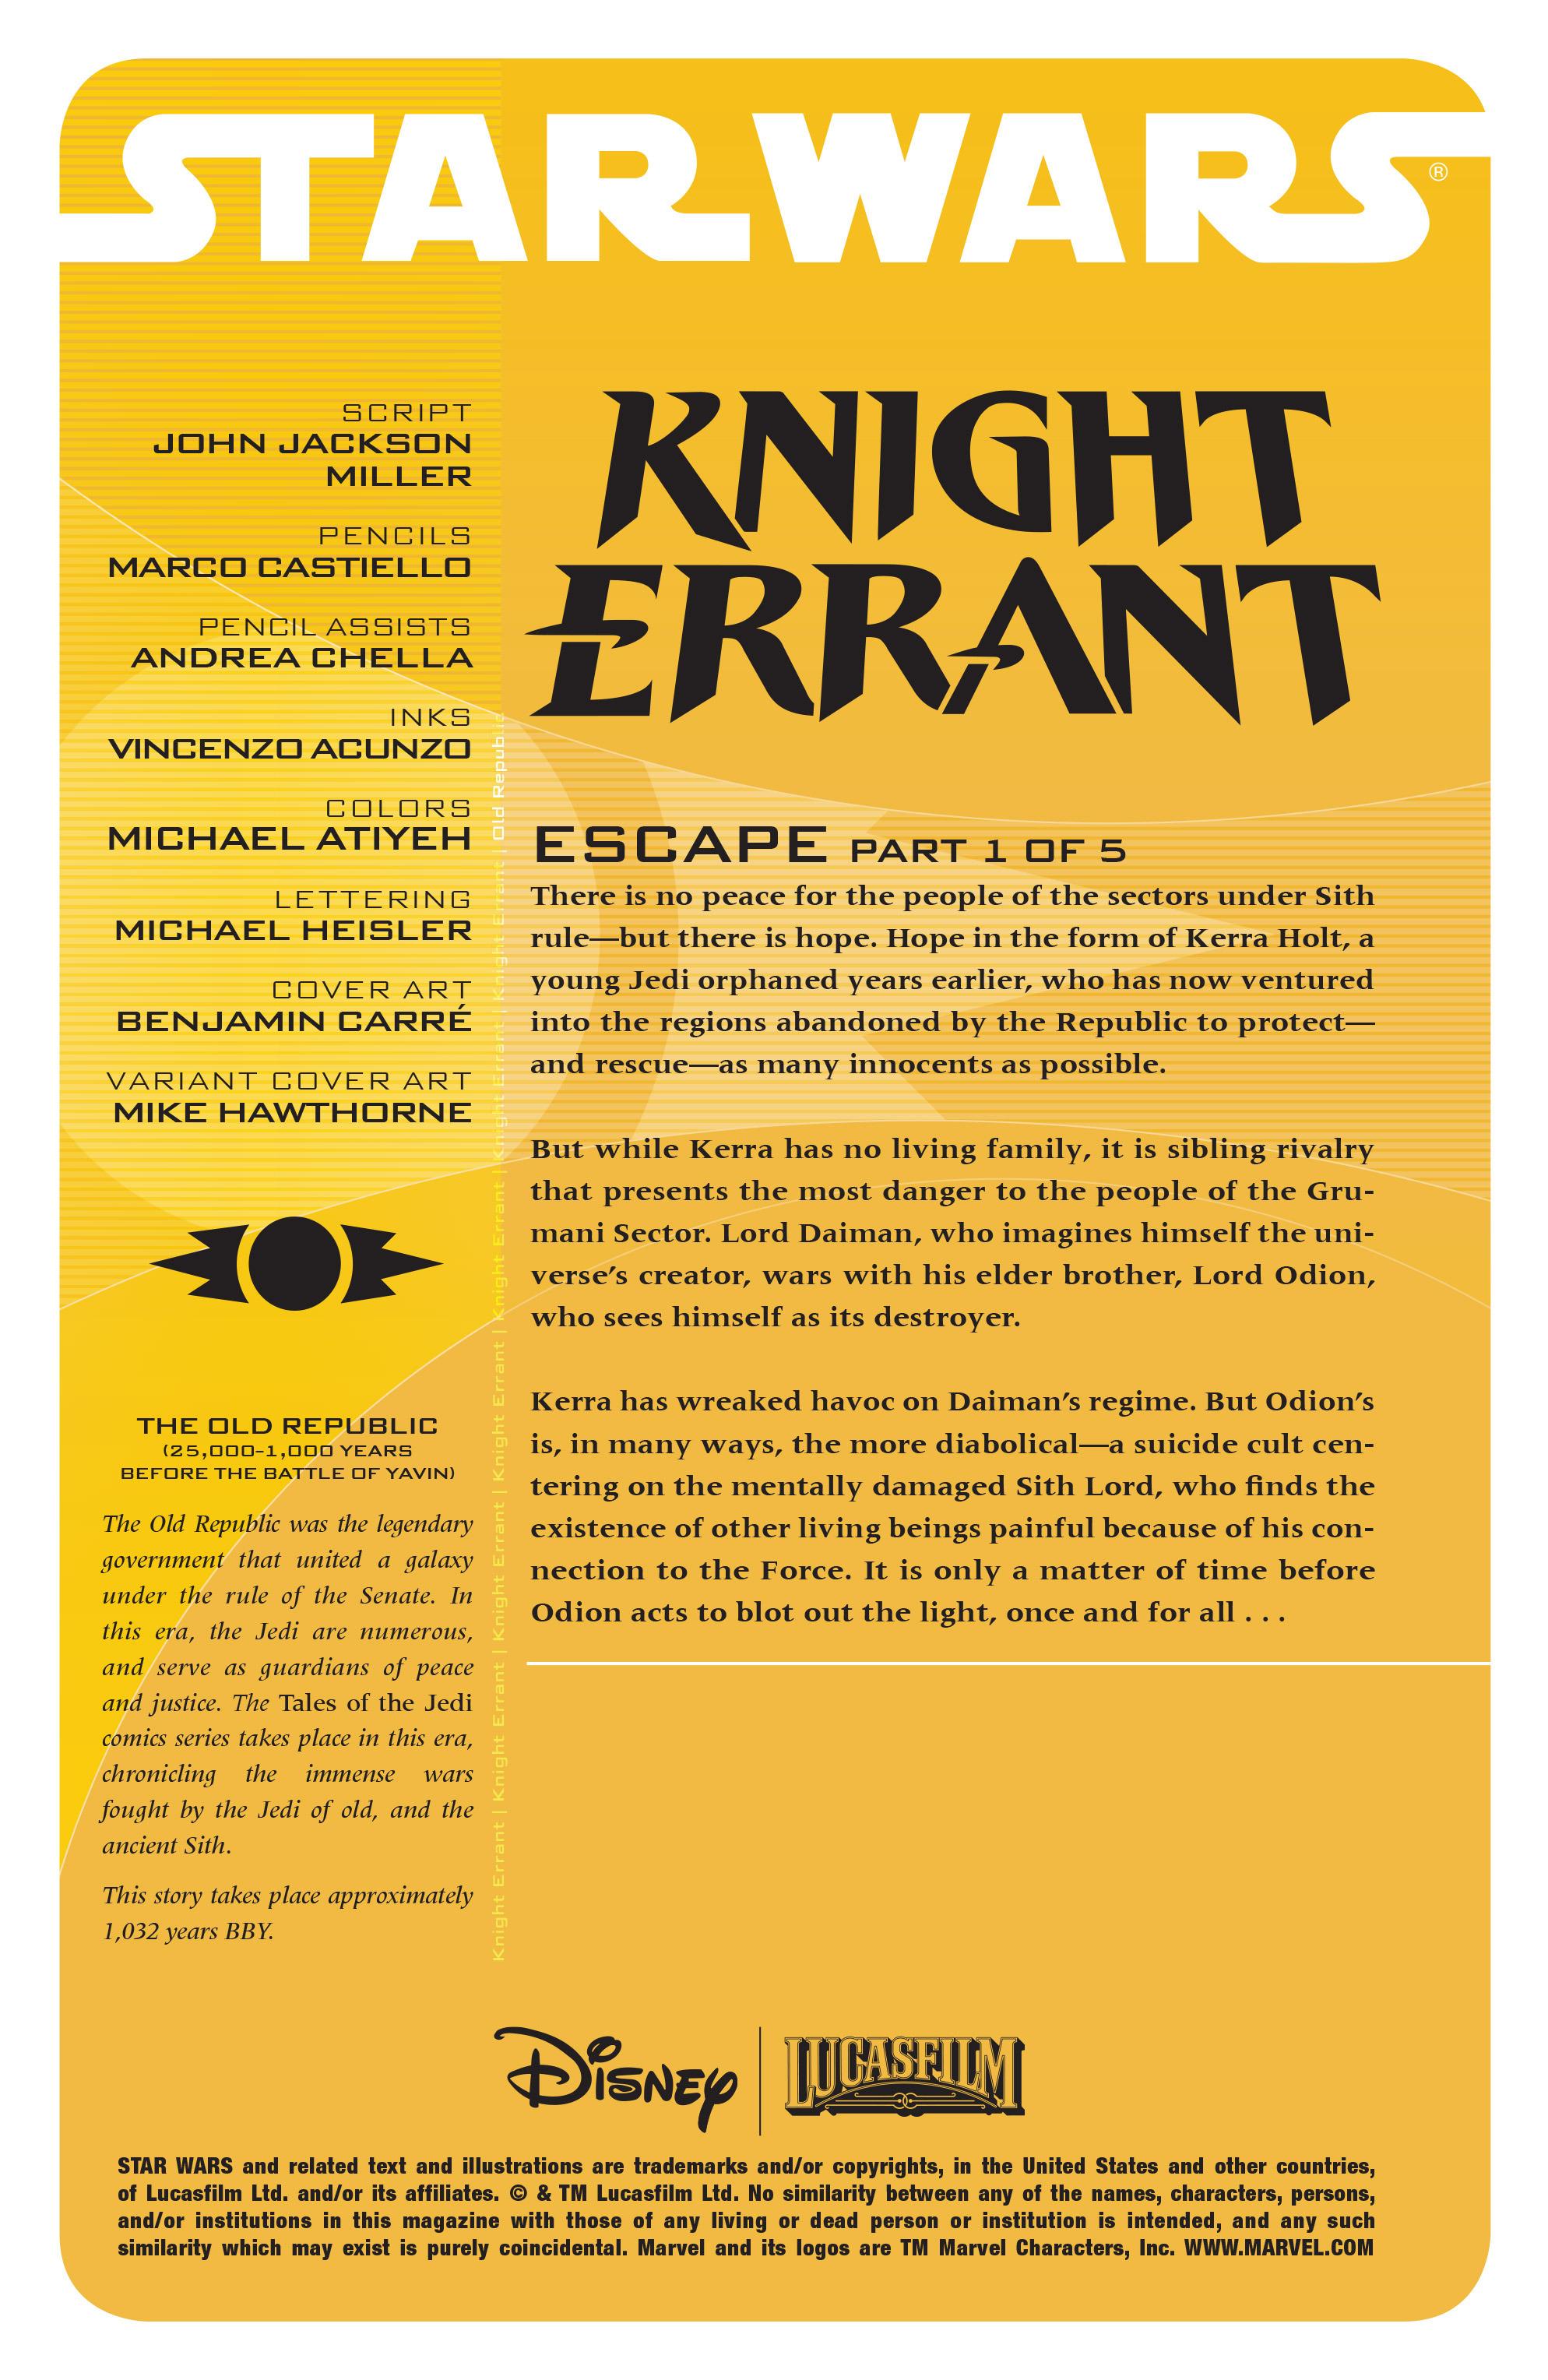 Read online Star Wars: Knight Errant - Escape comic -  Issue #1 - 2